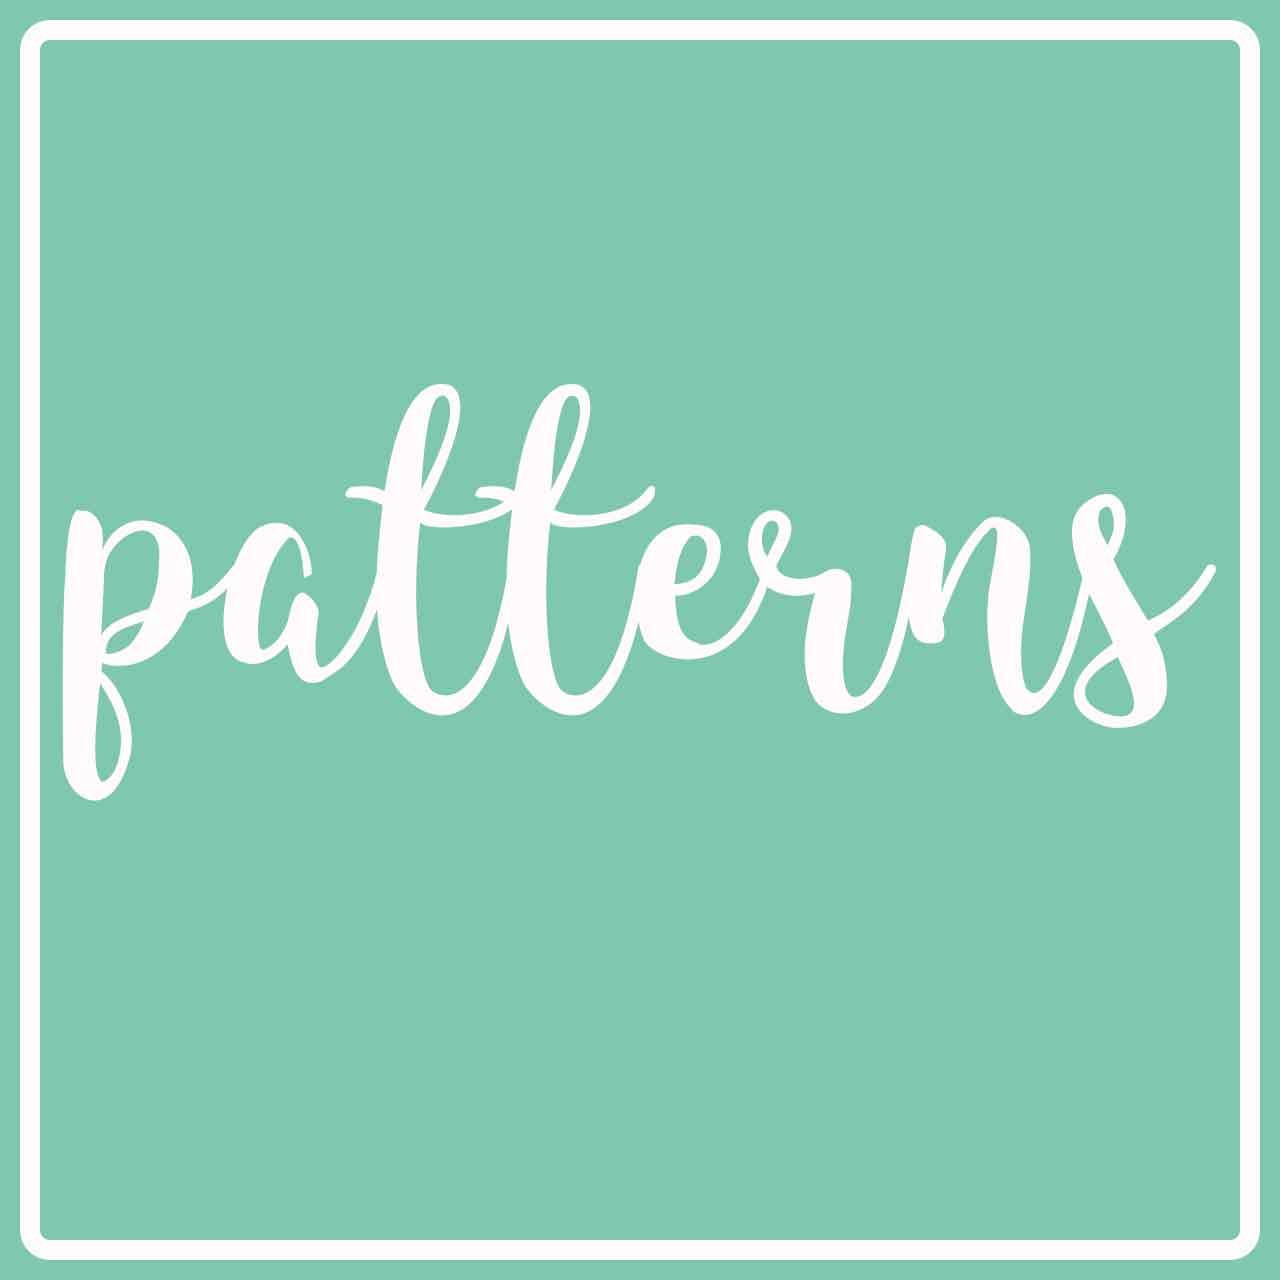 Holm Sown Online Fabric Shop - dressmaking sewing patterns